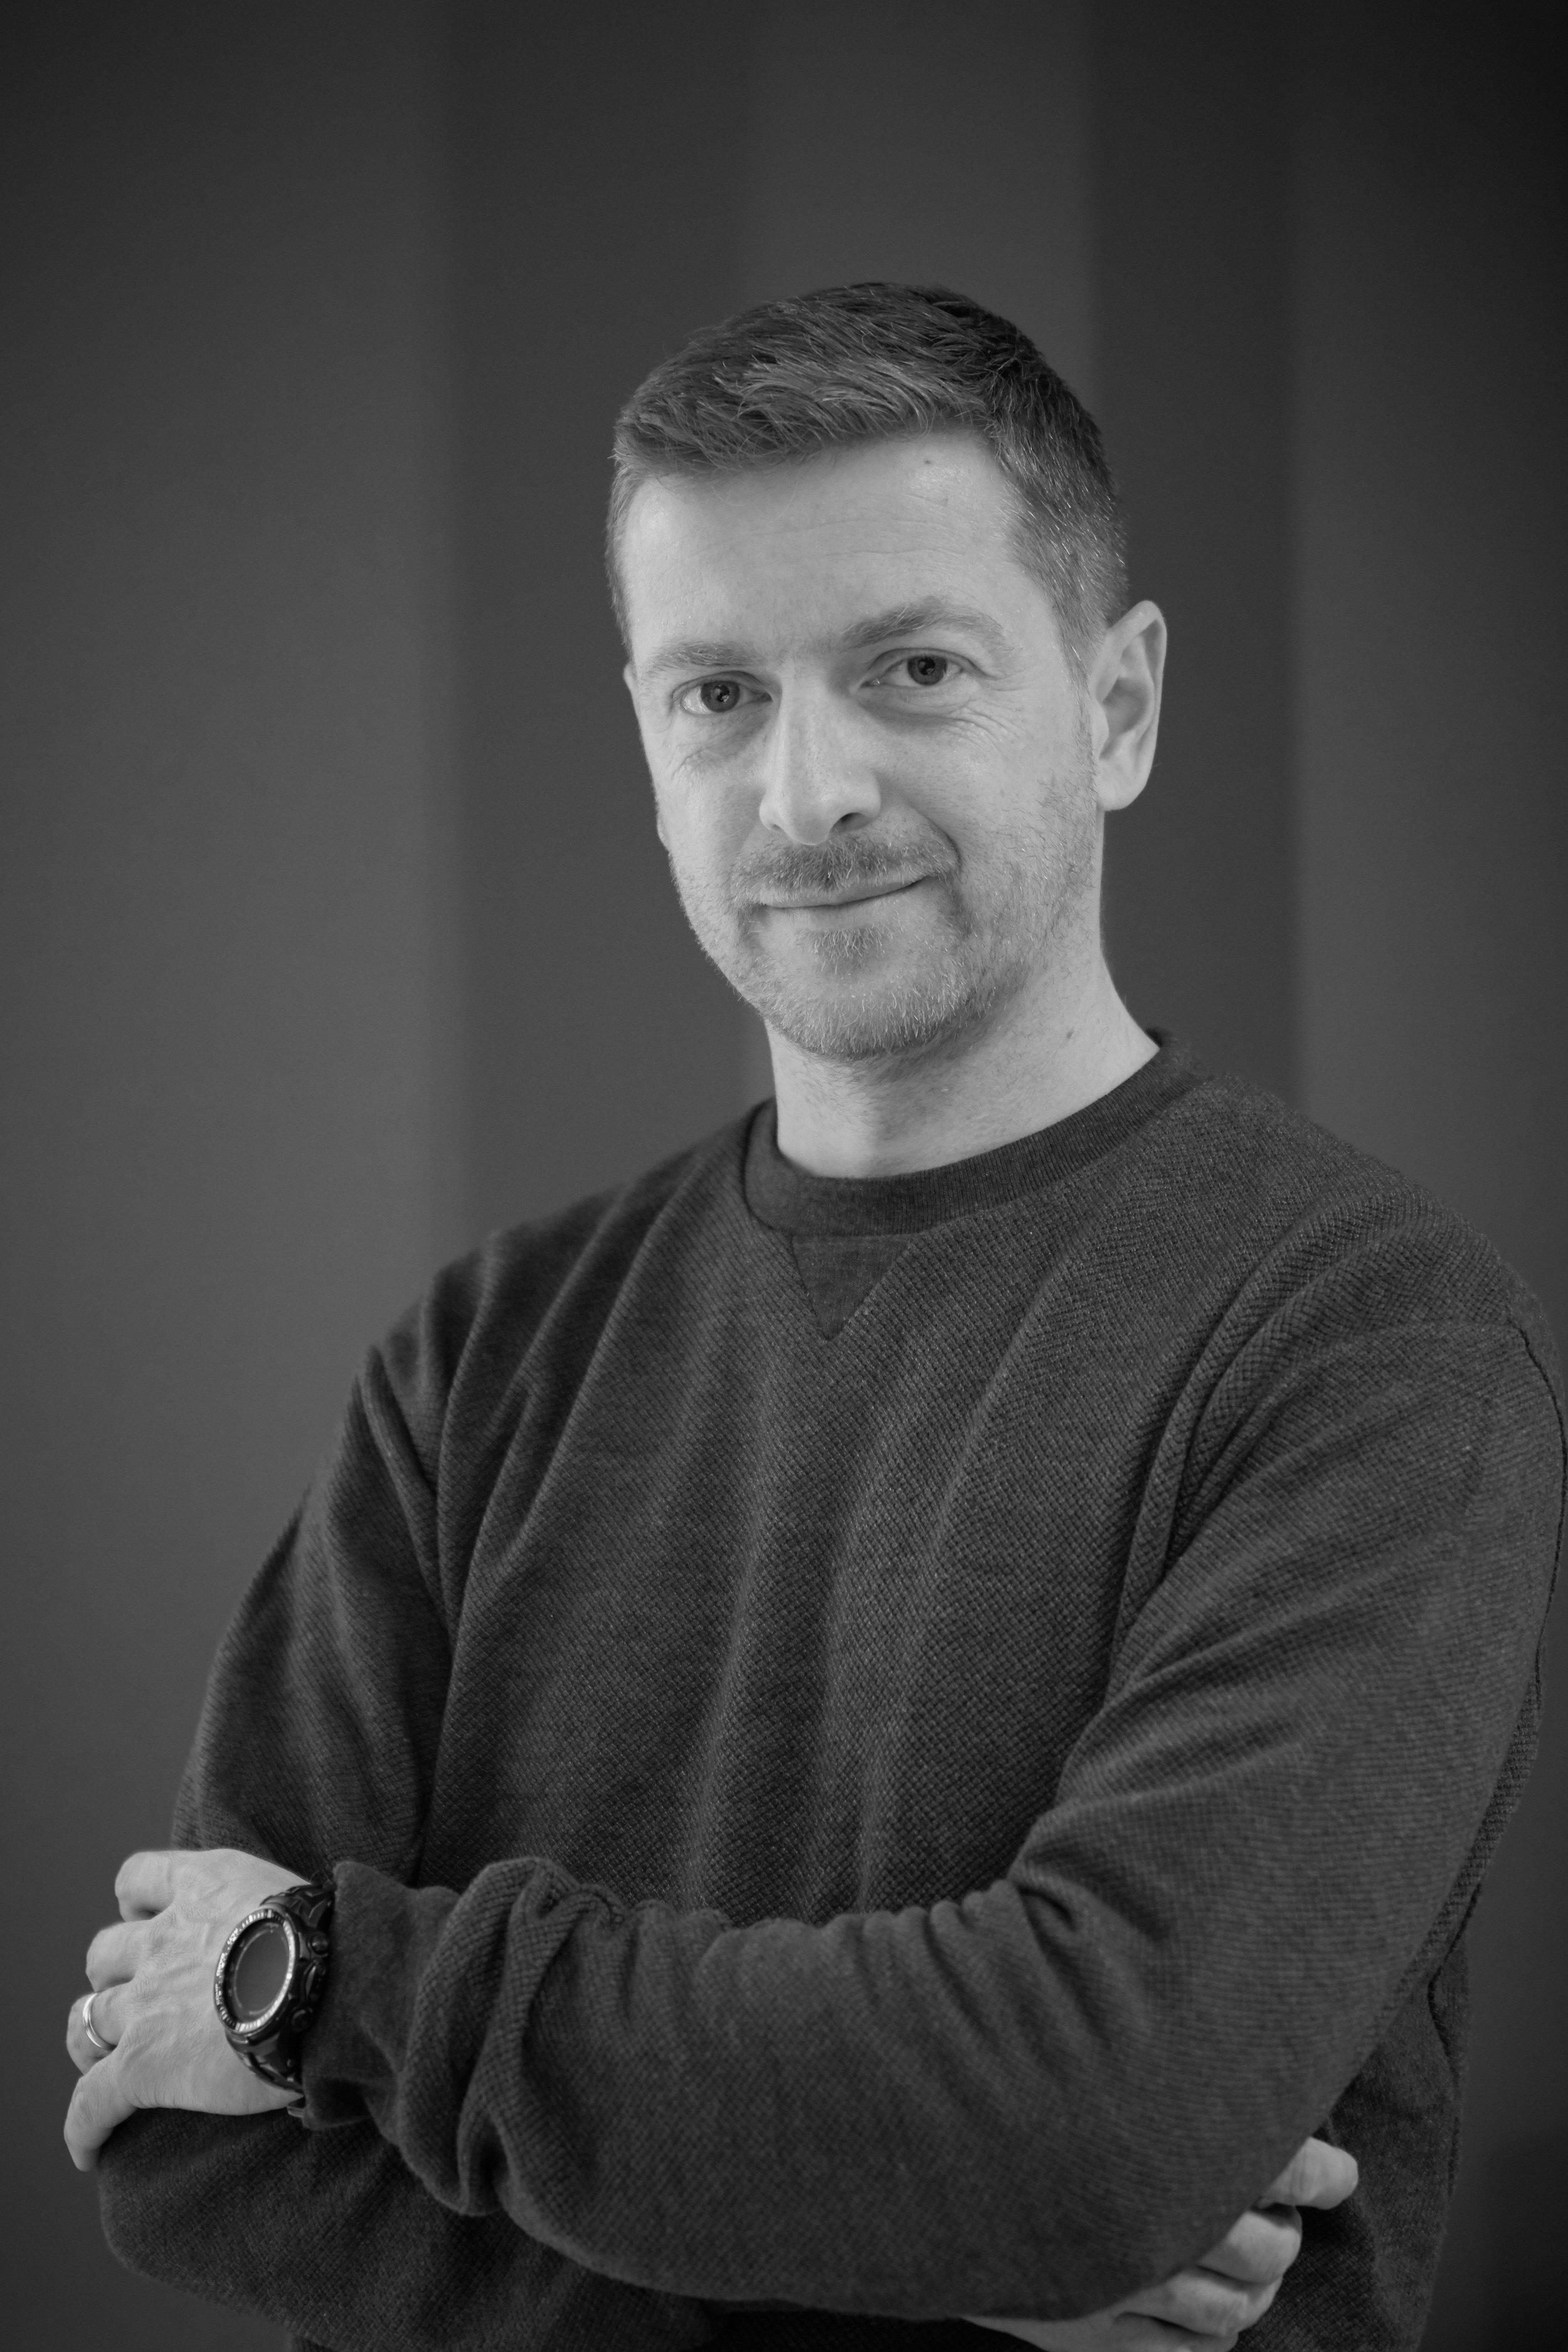 Uroš Vasiljević, Senior Architect